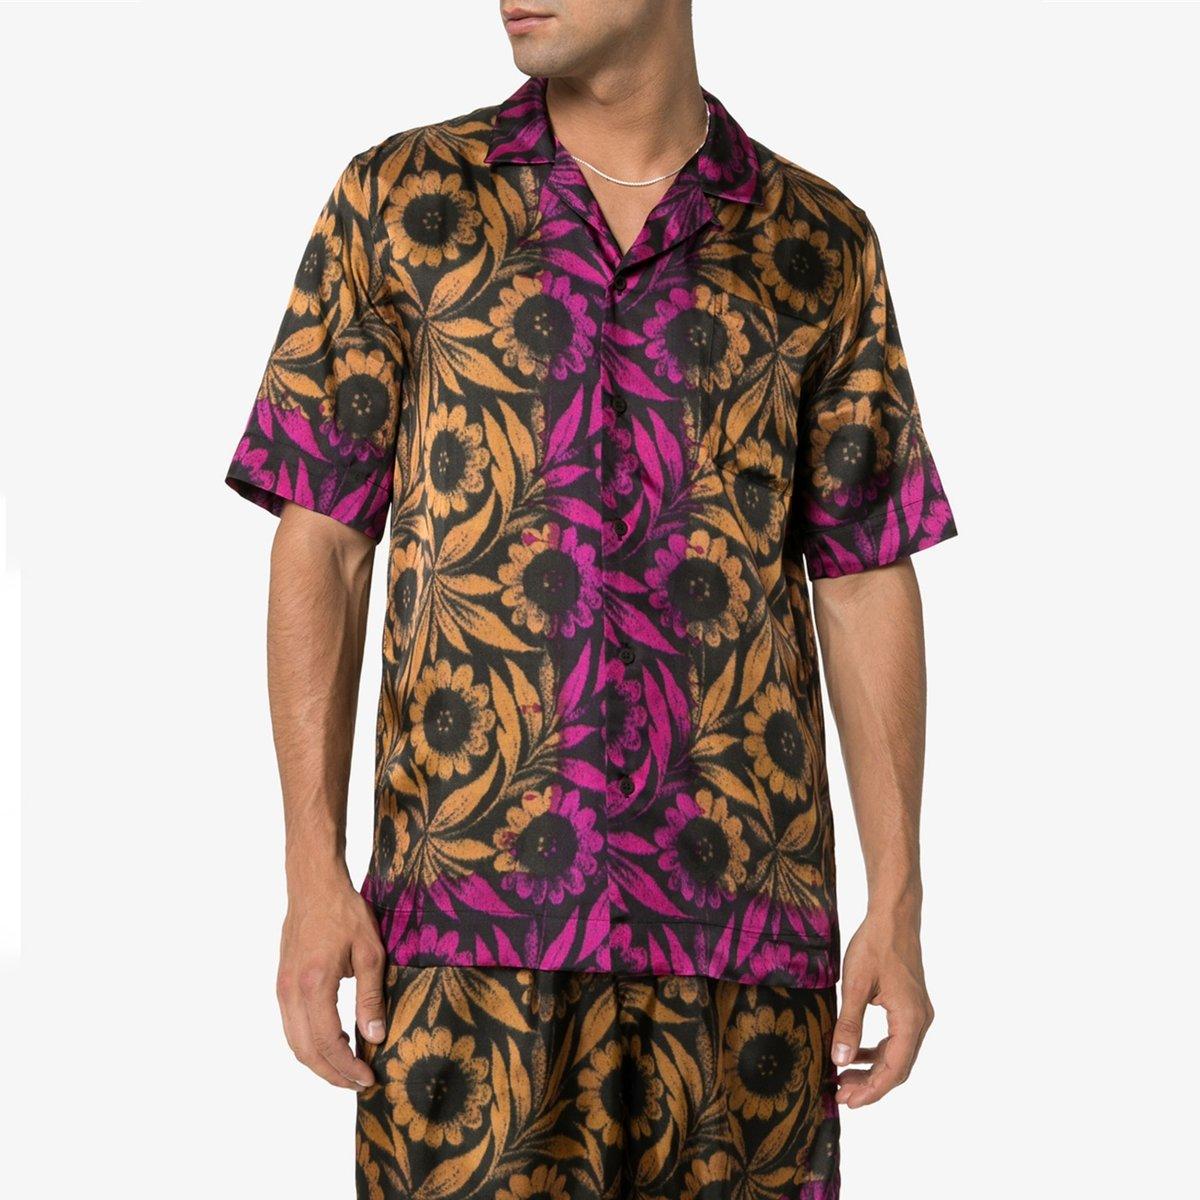 dries-van-noten-carlton-printed-shirt_14139289_20088730_1920.jpg